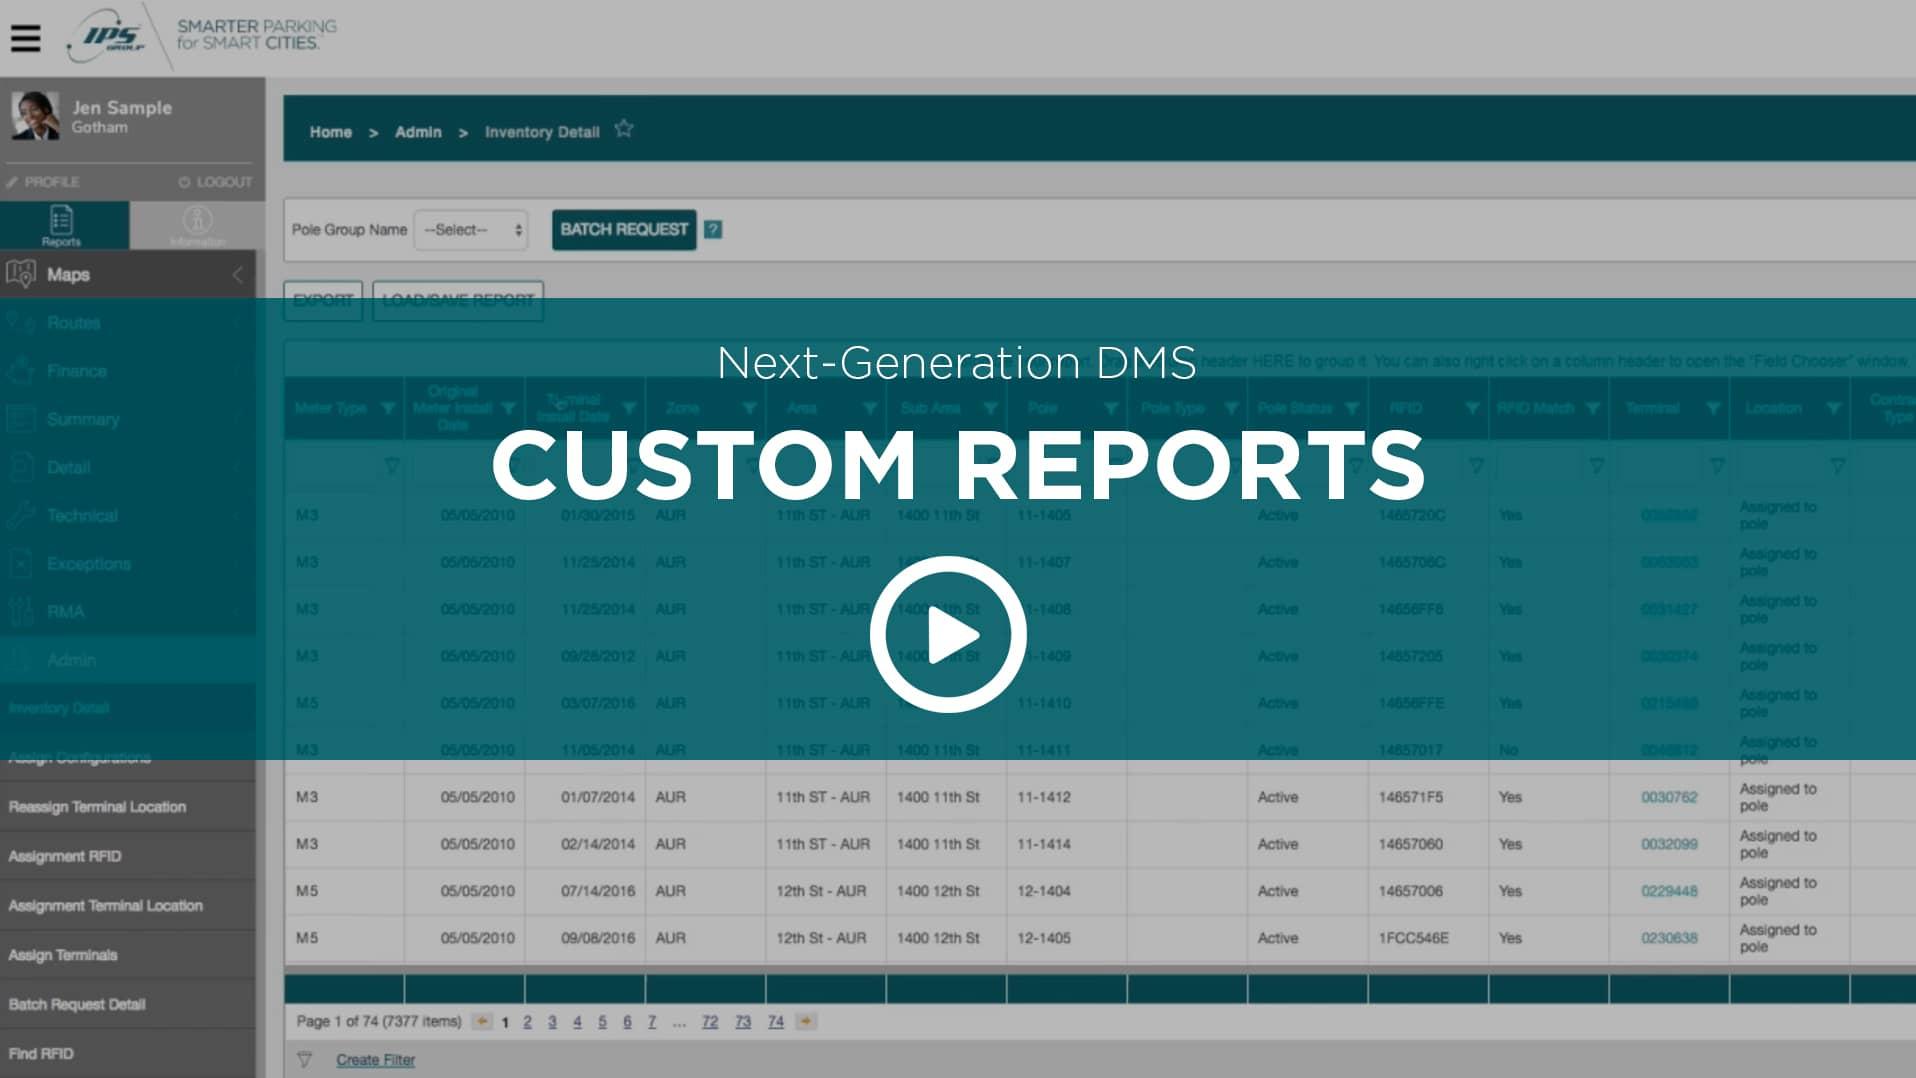 Next Generation DMS Custom Reports